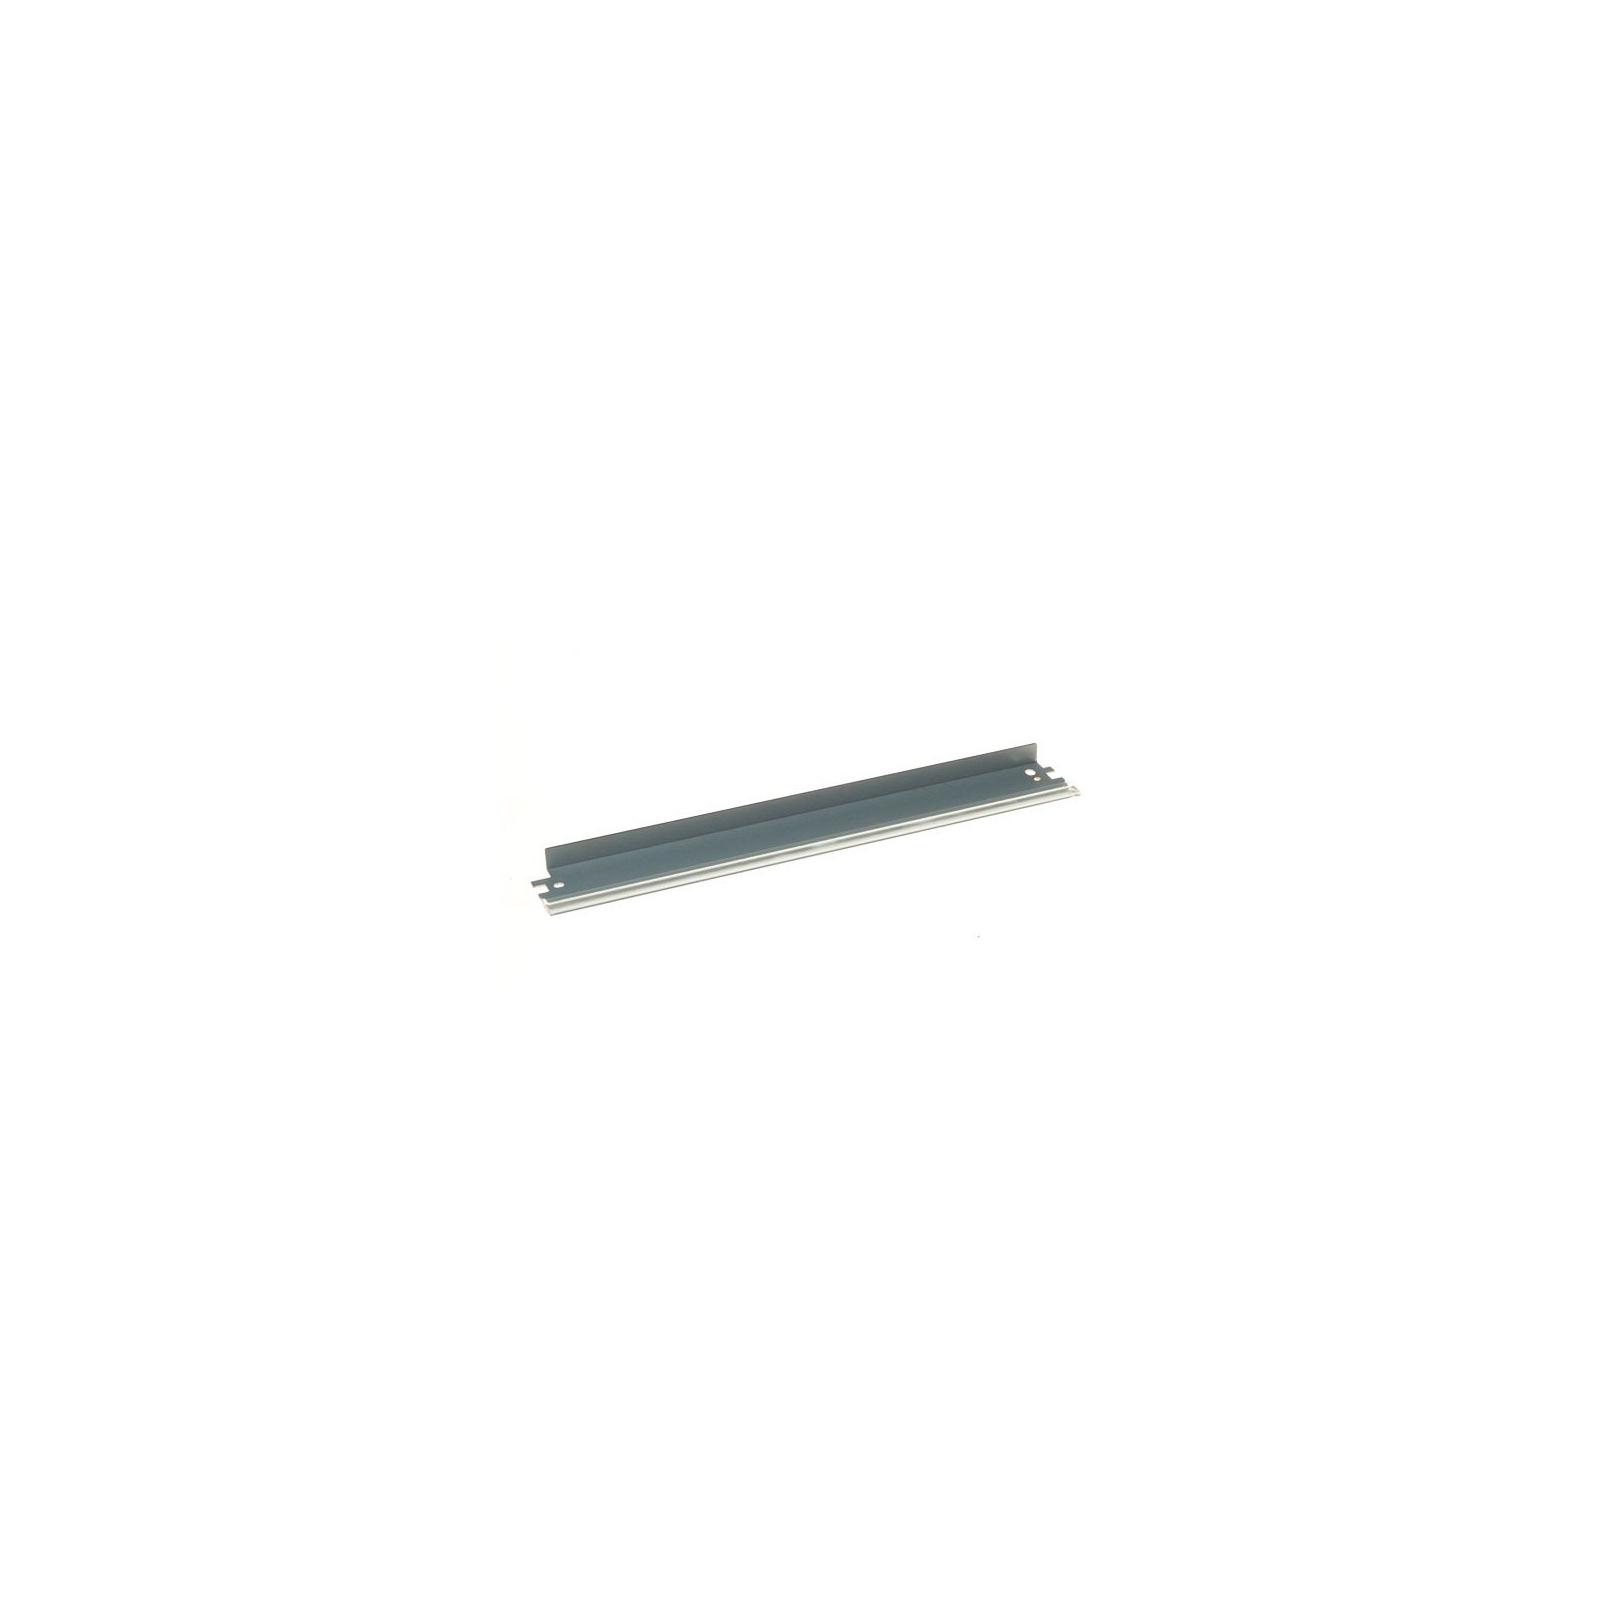 Чистящее лезвие EVERPRINT SAMSUNG ML-2850, SCX-4824/4828, Phaser 3250/3140 (WB-ML-2850-EVP)